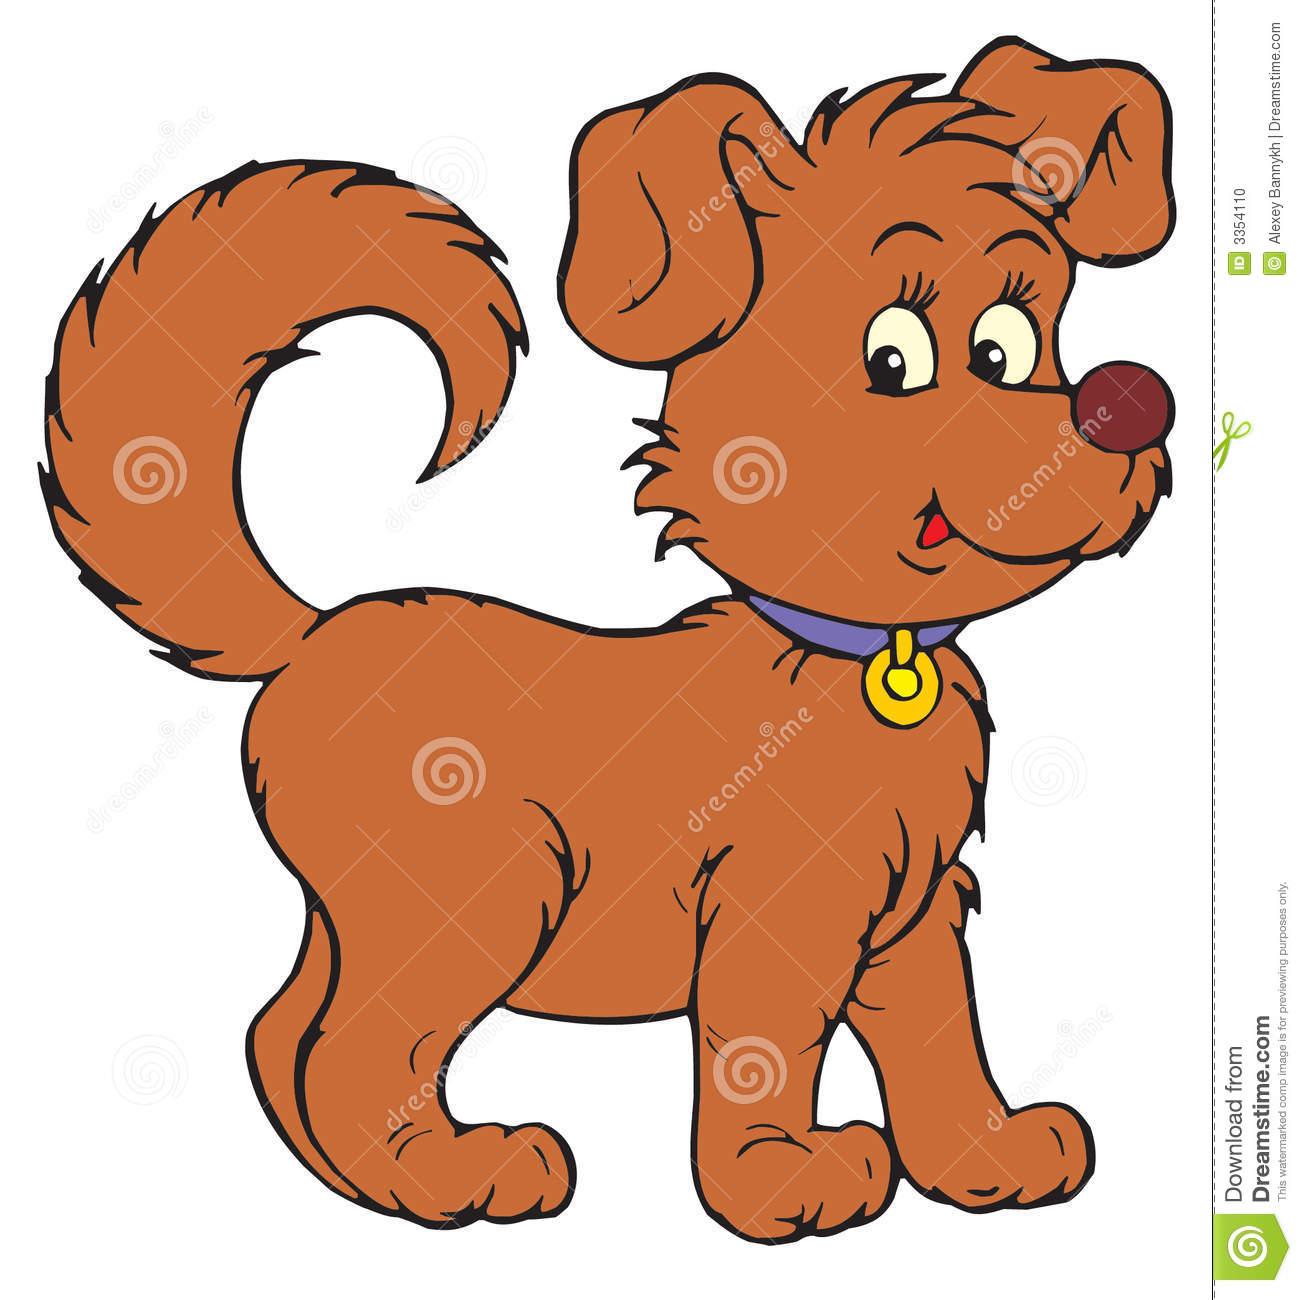 Clip art of dogs - ClipartFest-Clip art of dogs - ClipartFest-12